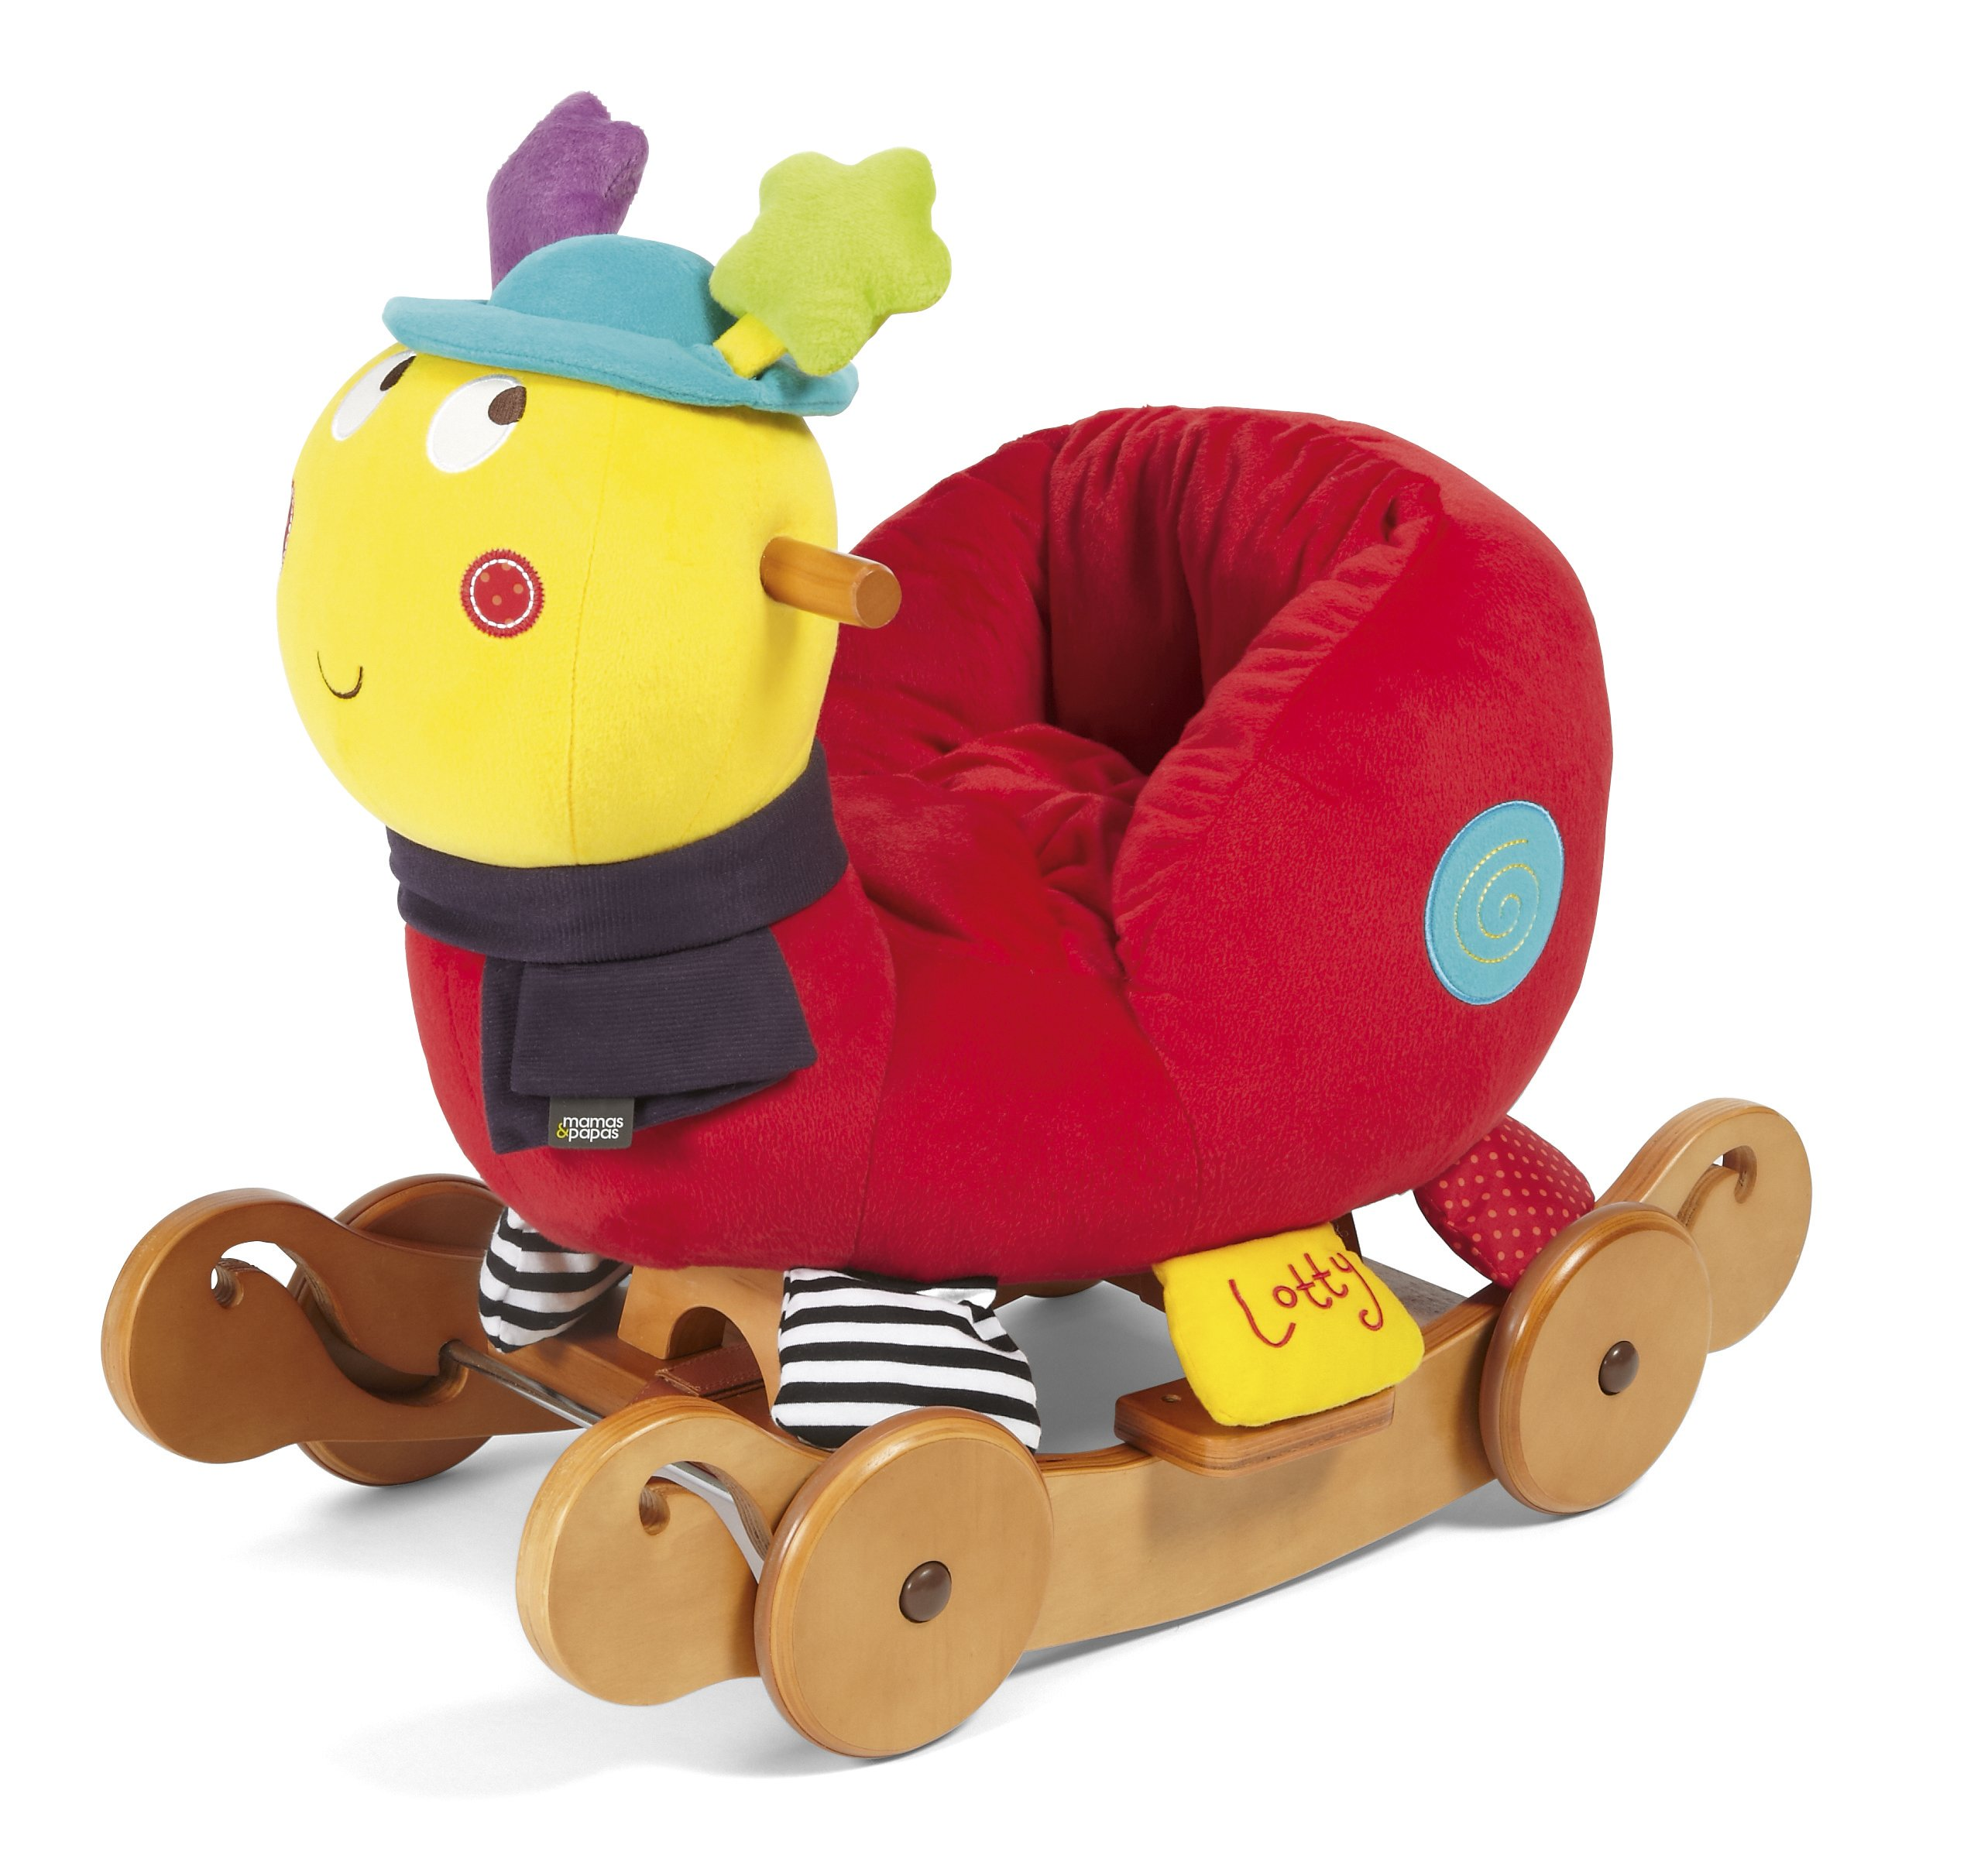 Mamas & Papas Baby Play - Lotty Rock & Ride